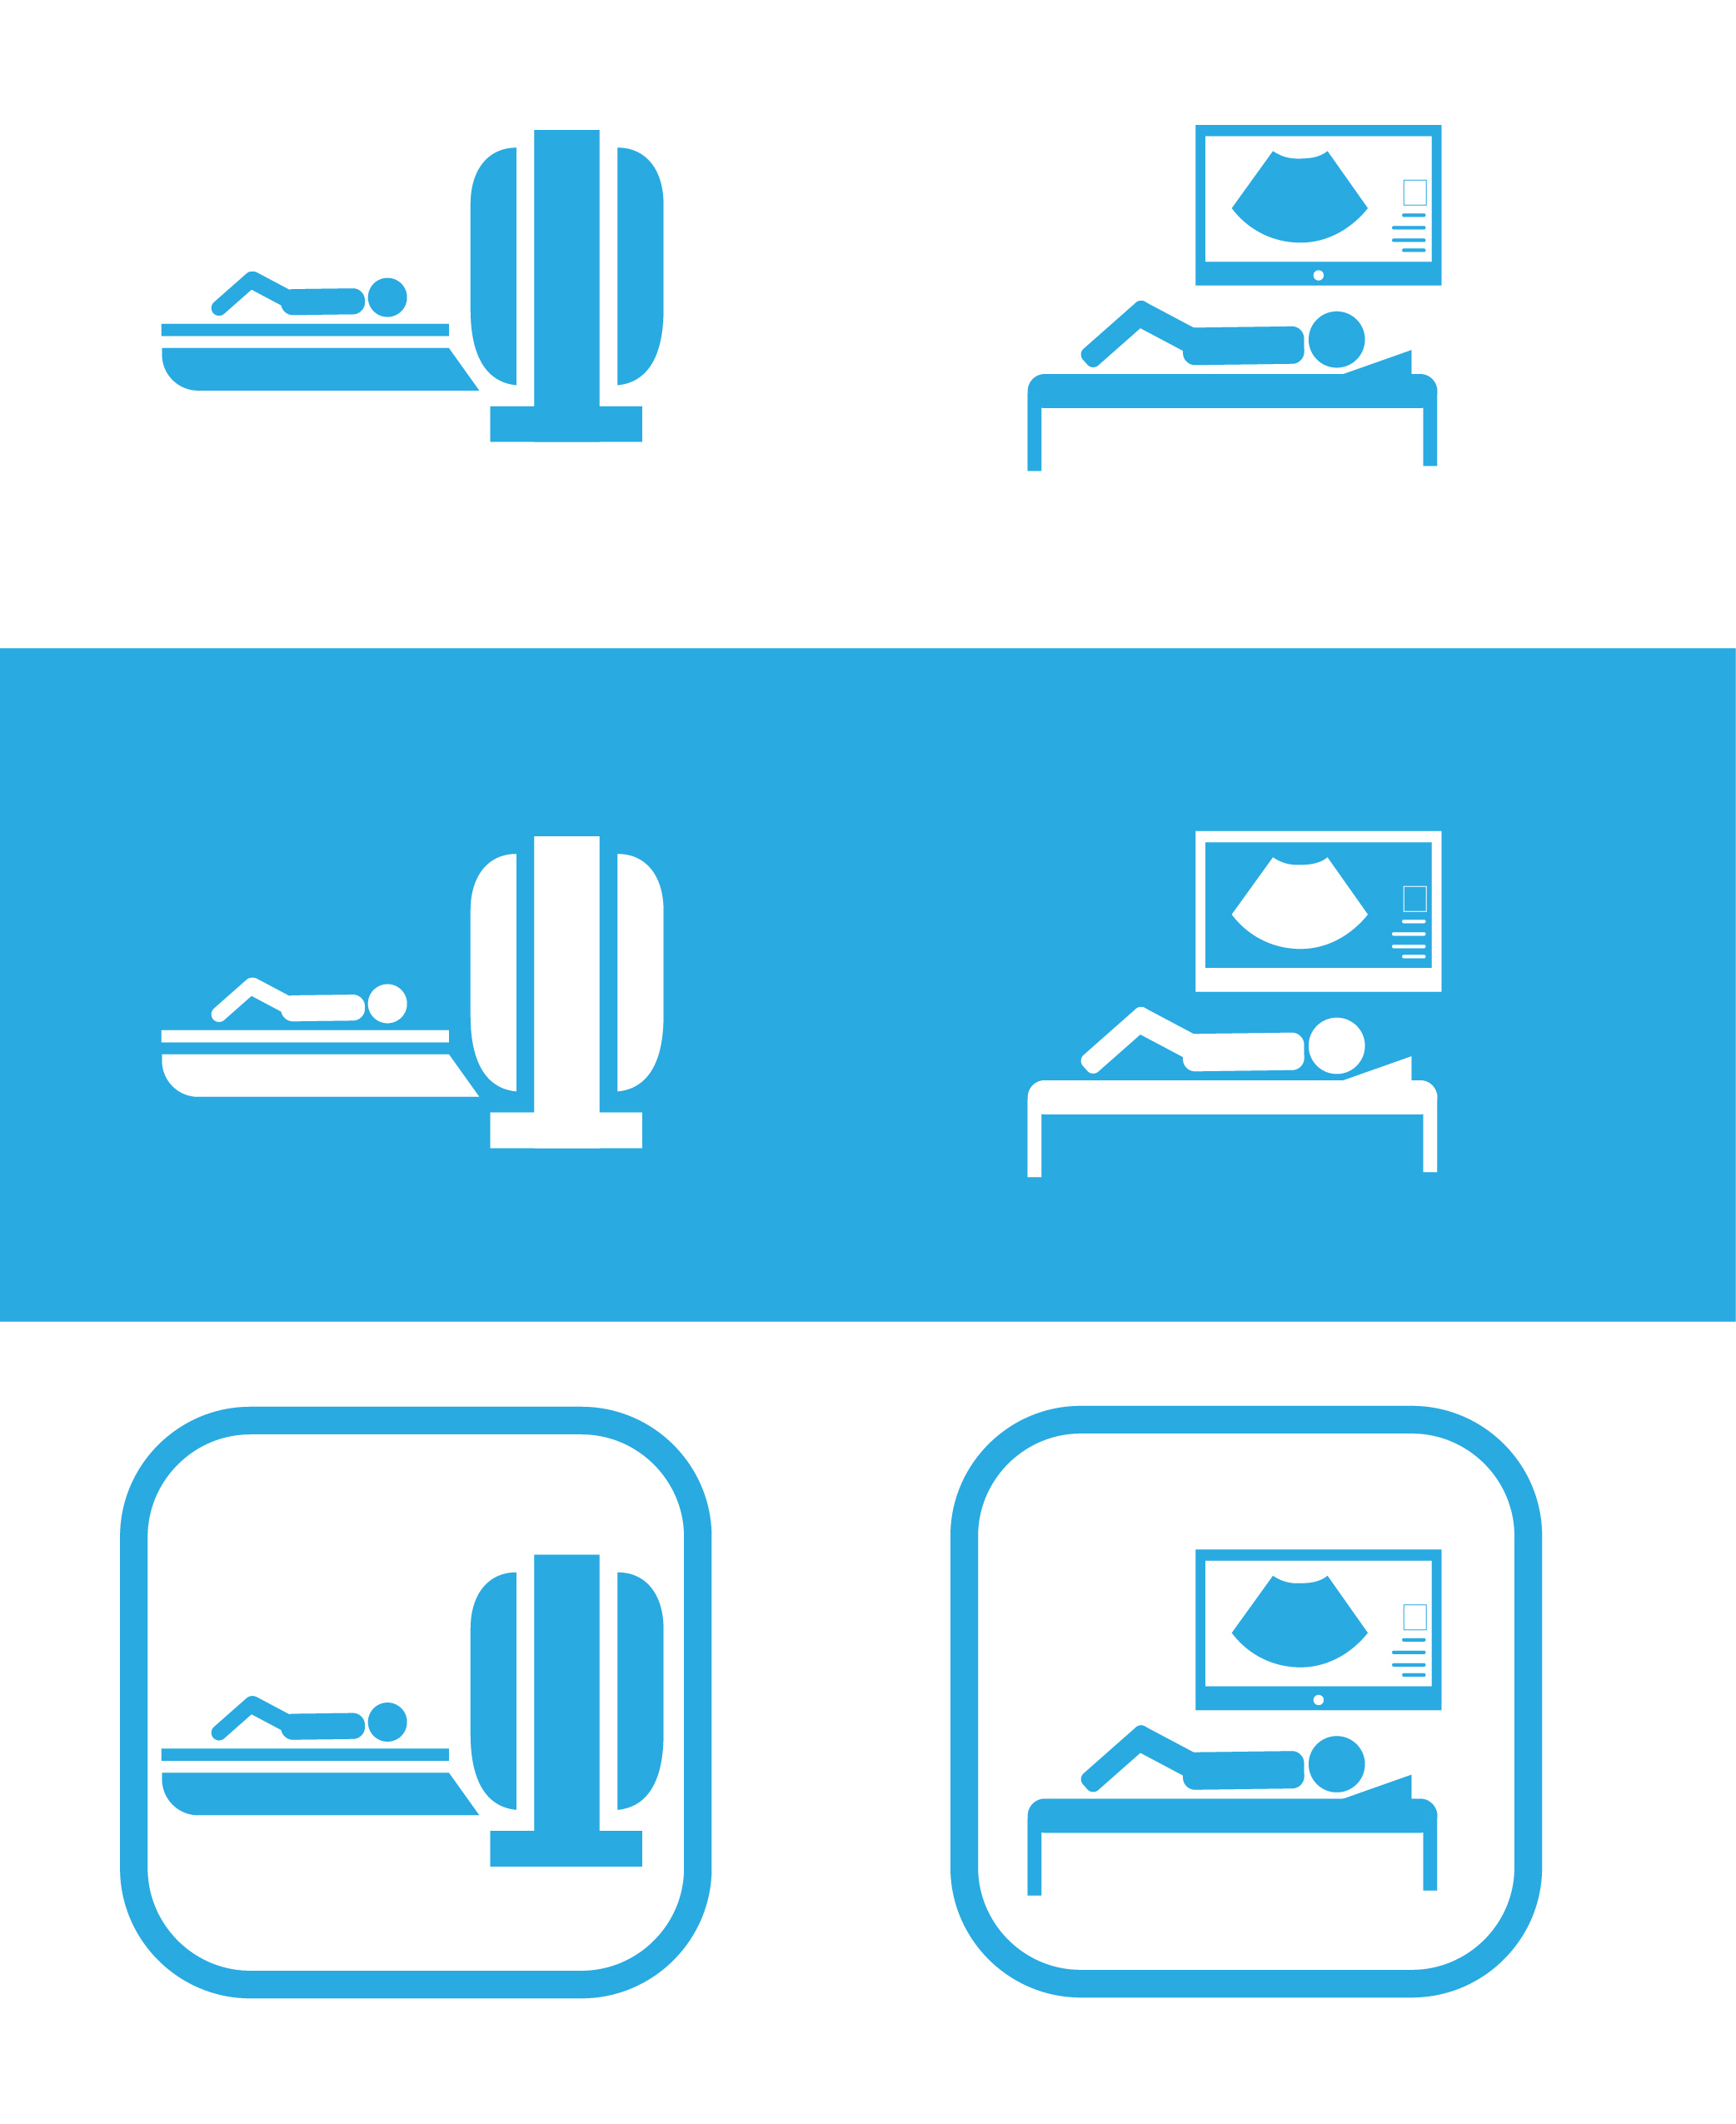 Разработка иконок для медицинских услуг фото f_261598de72820a23.jpg